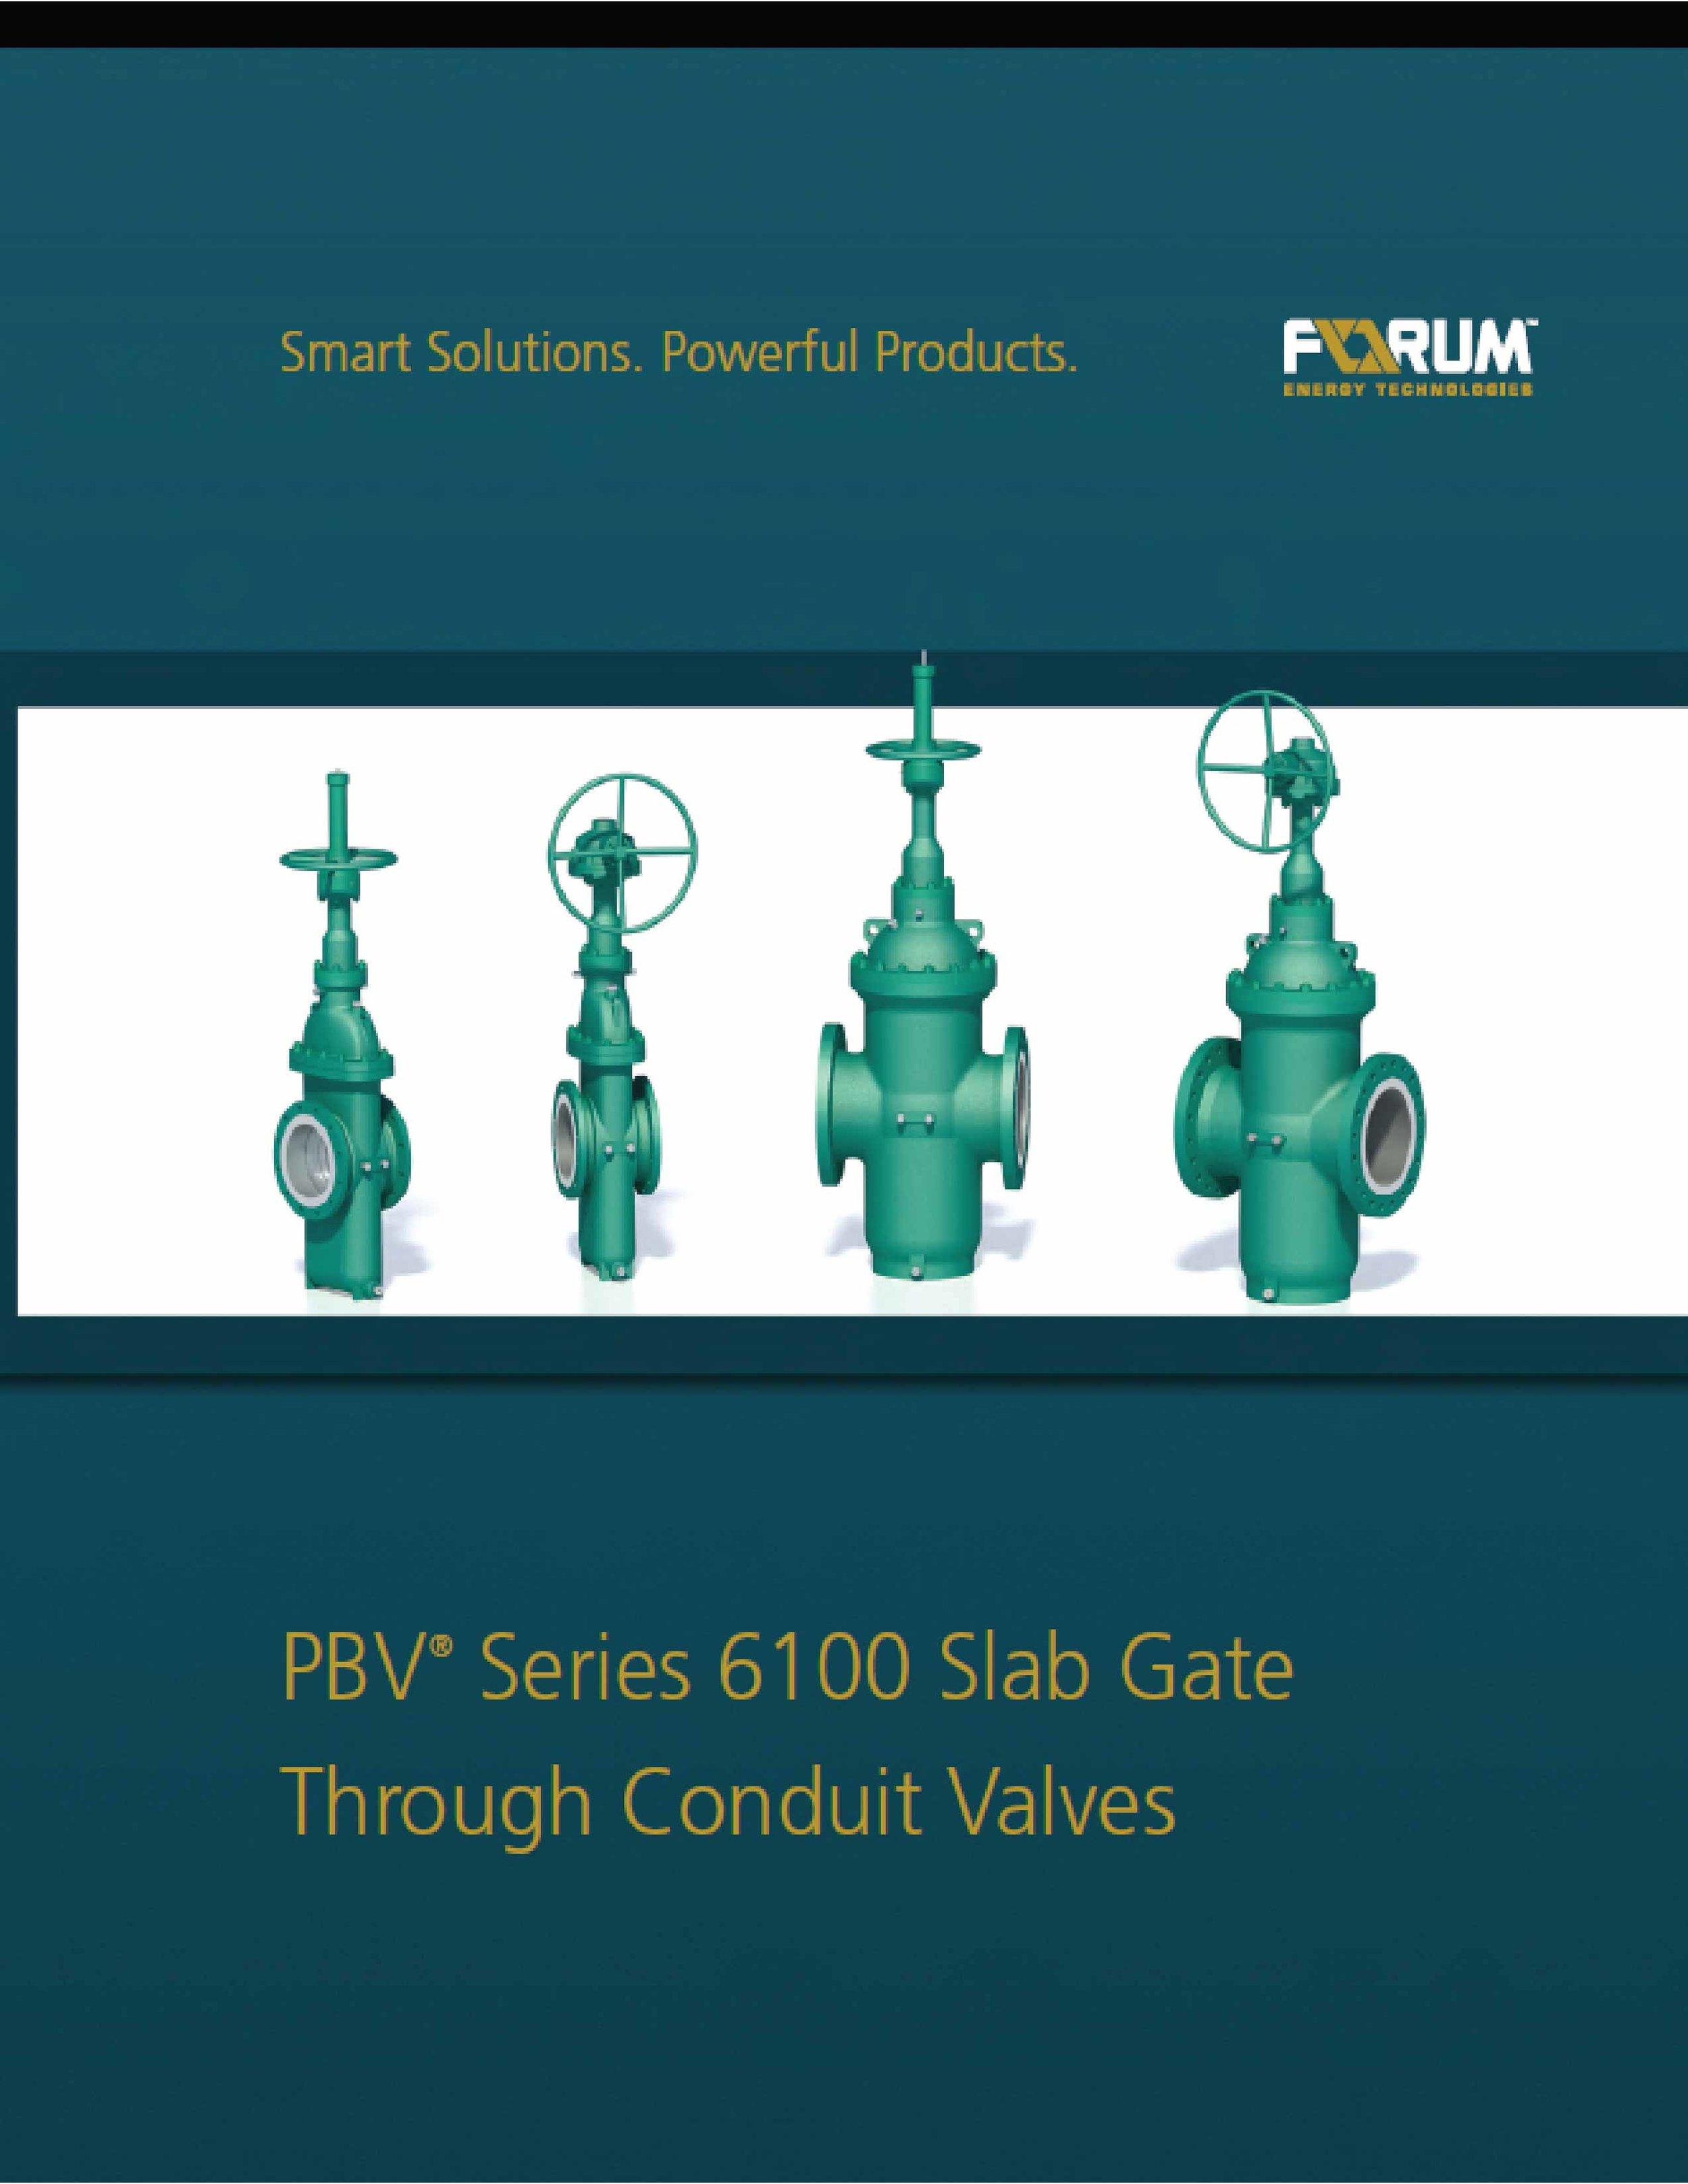 PBV_slab gate brochure-01.jpg